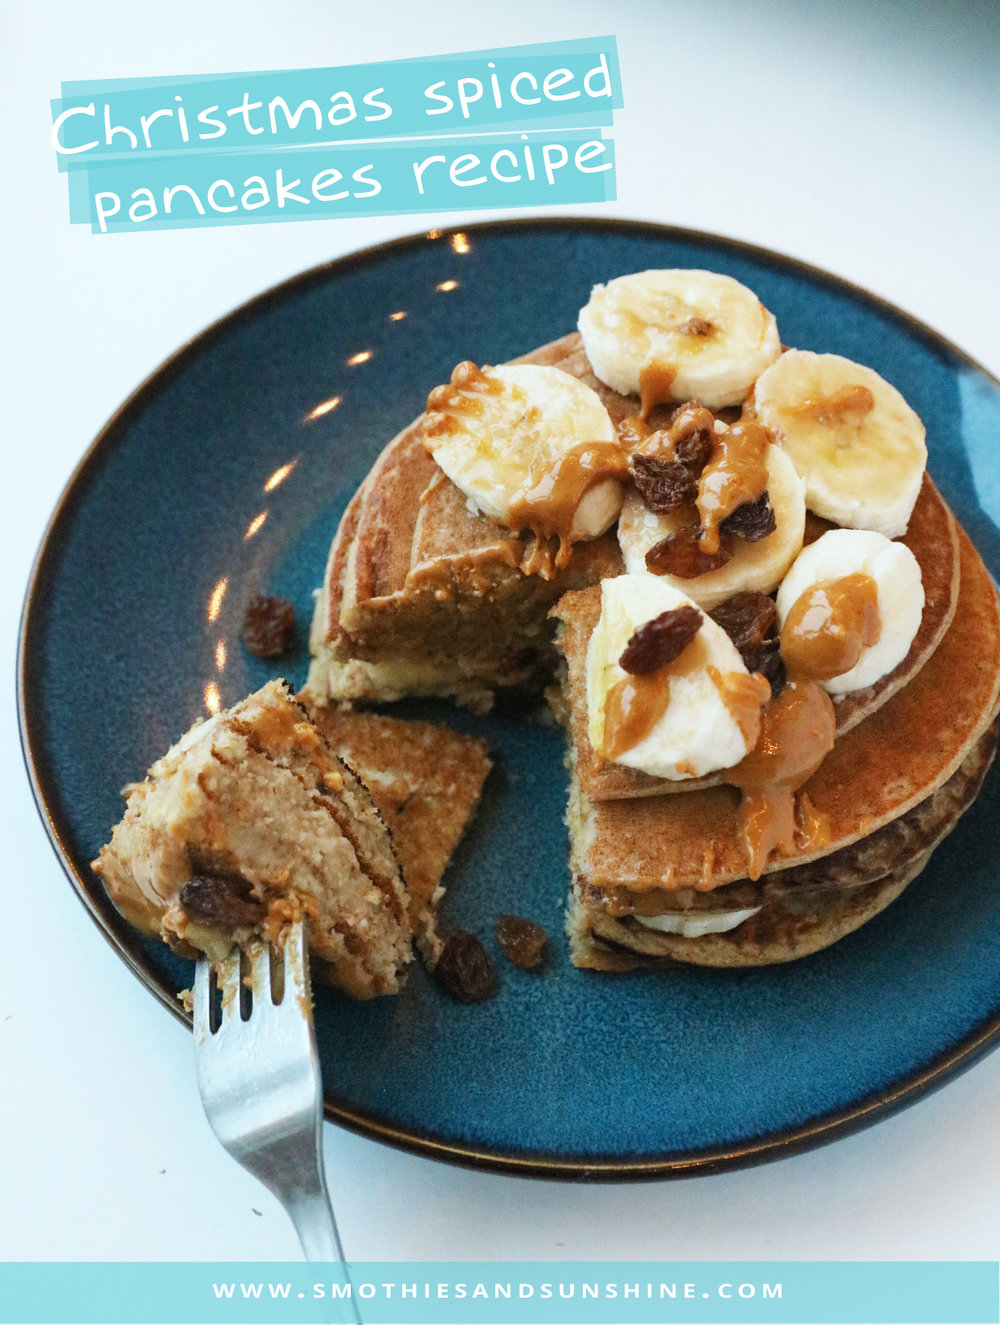 spiced-christmas-pancakes-recipe-pinterest.jpg